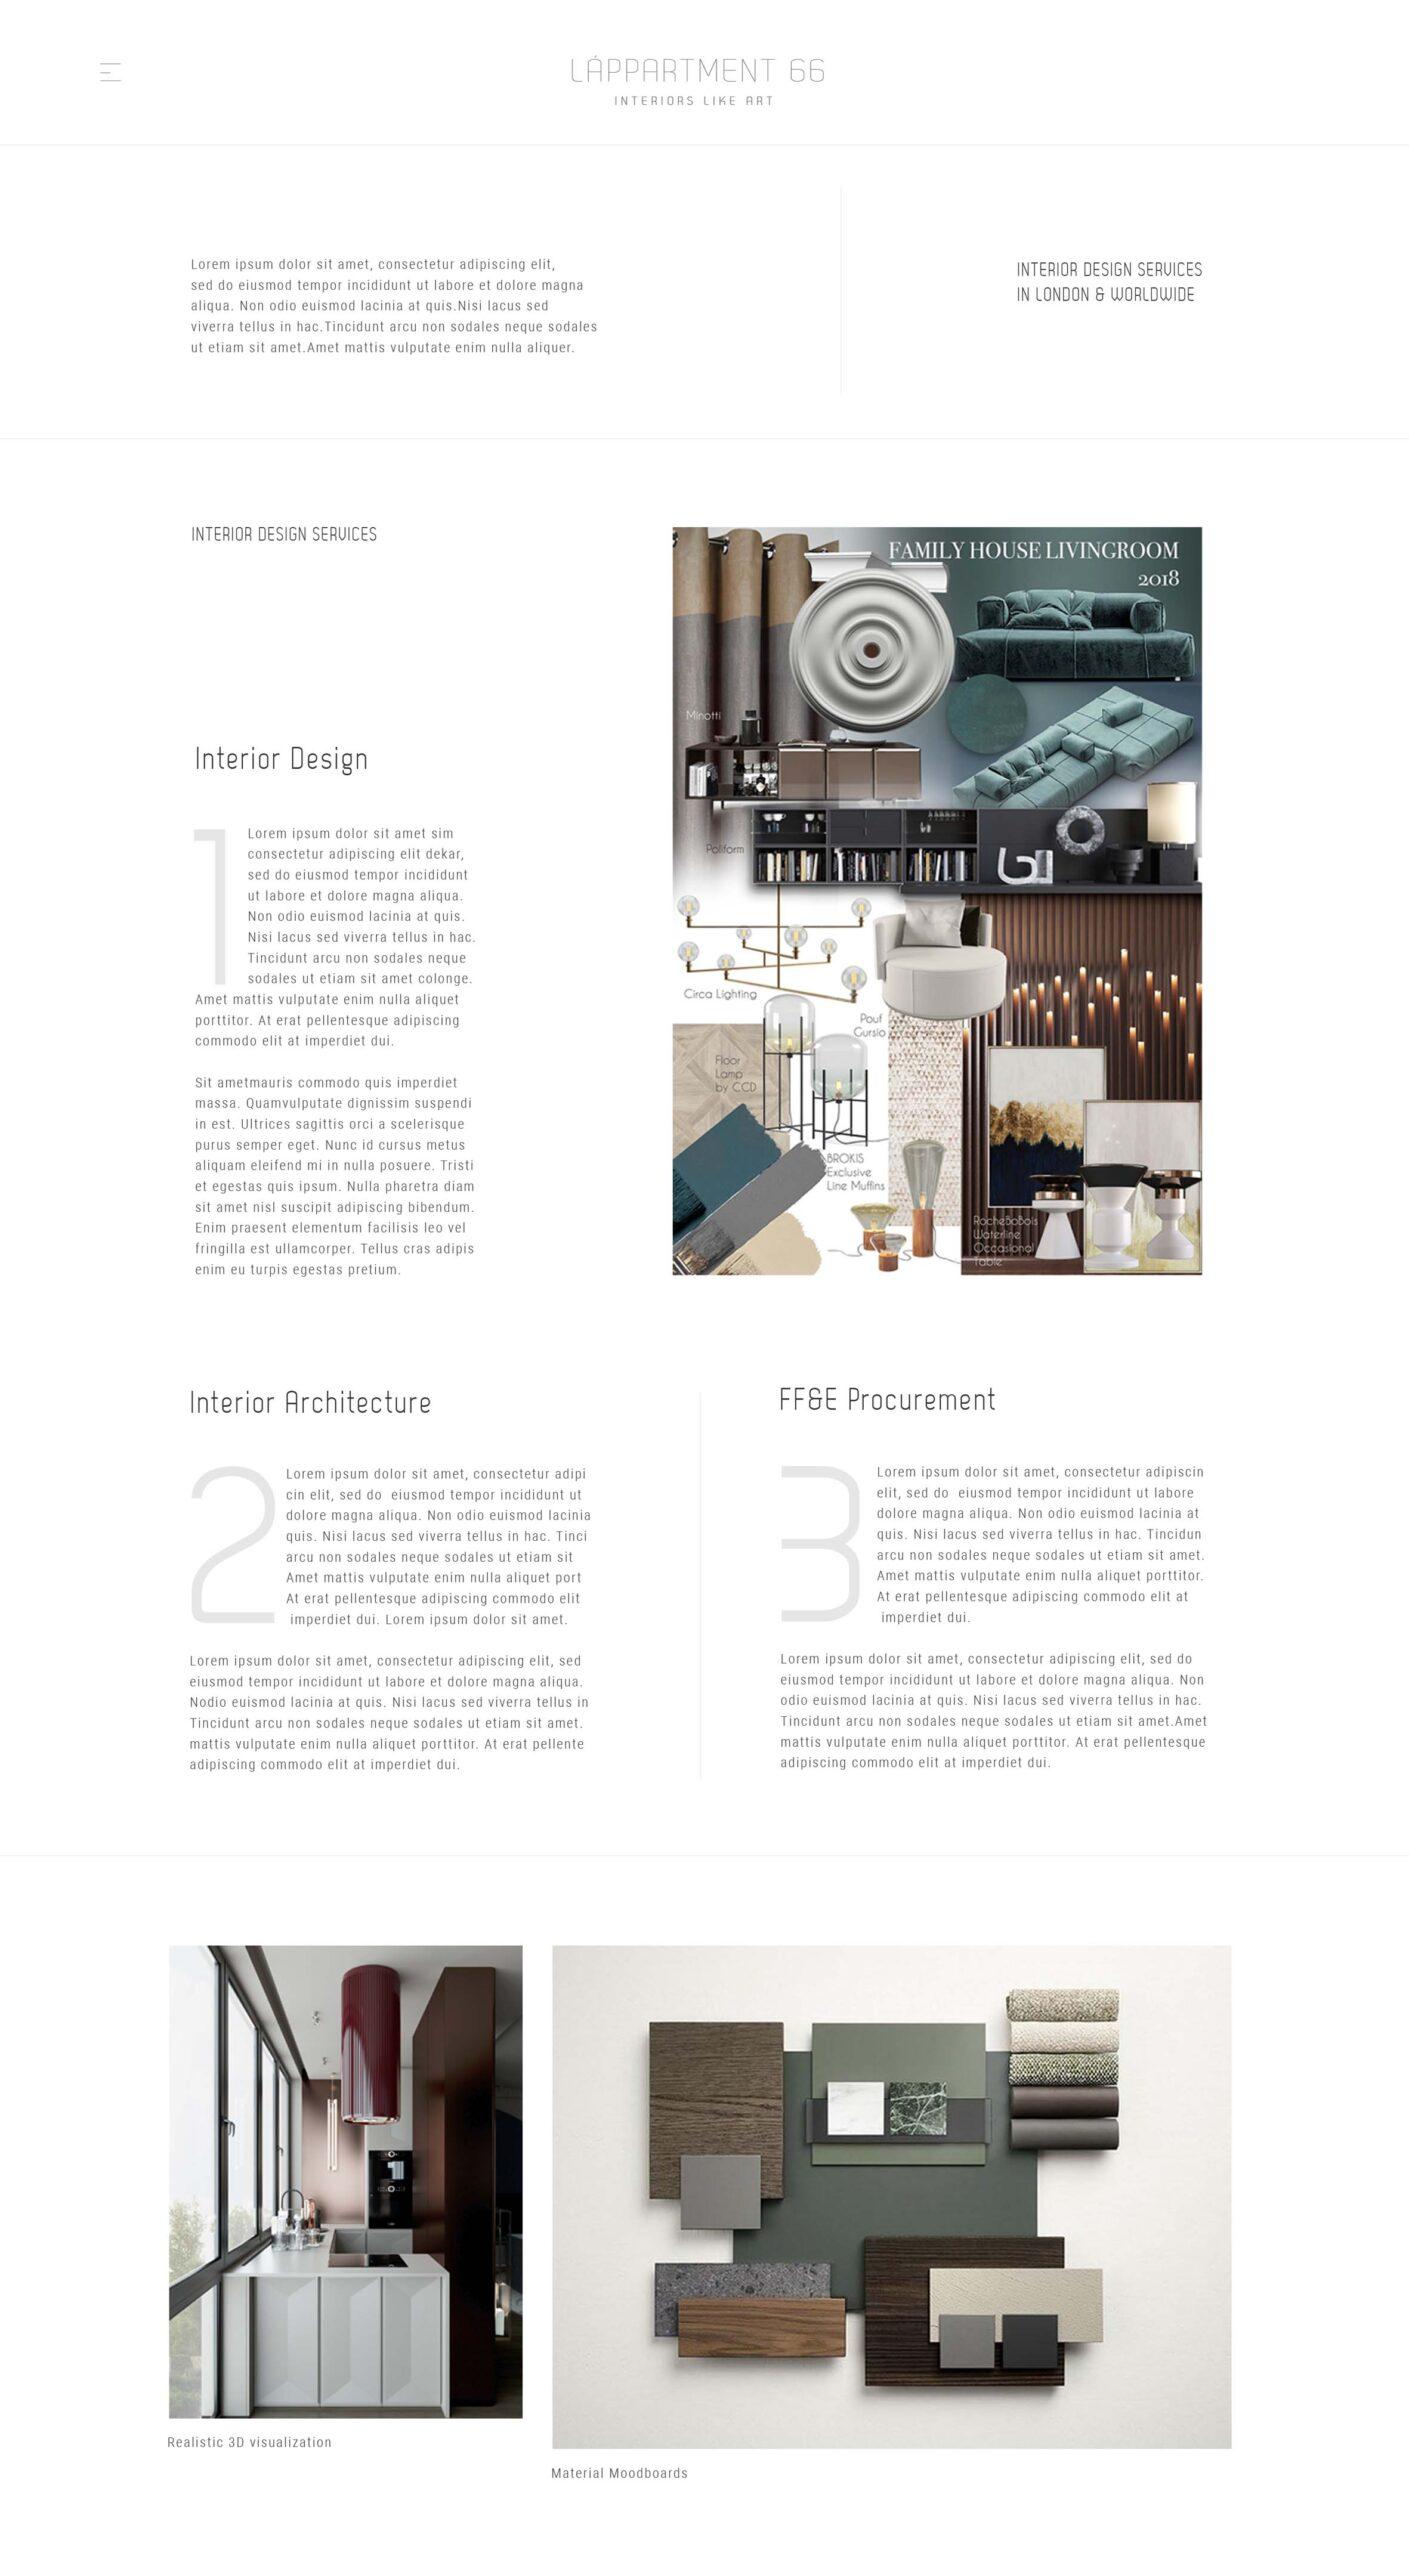 web design lappartement 66